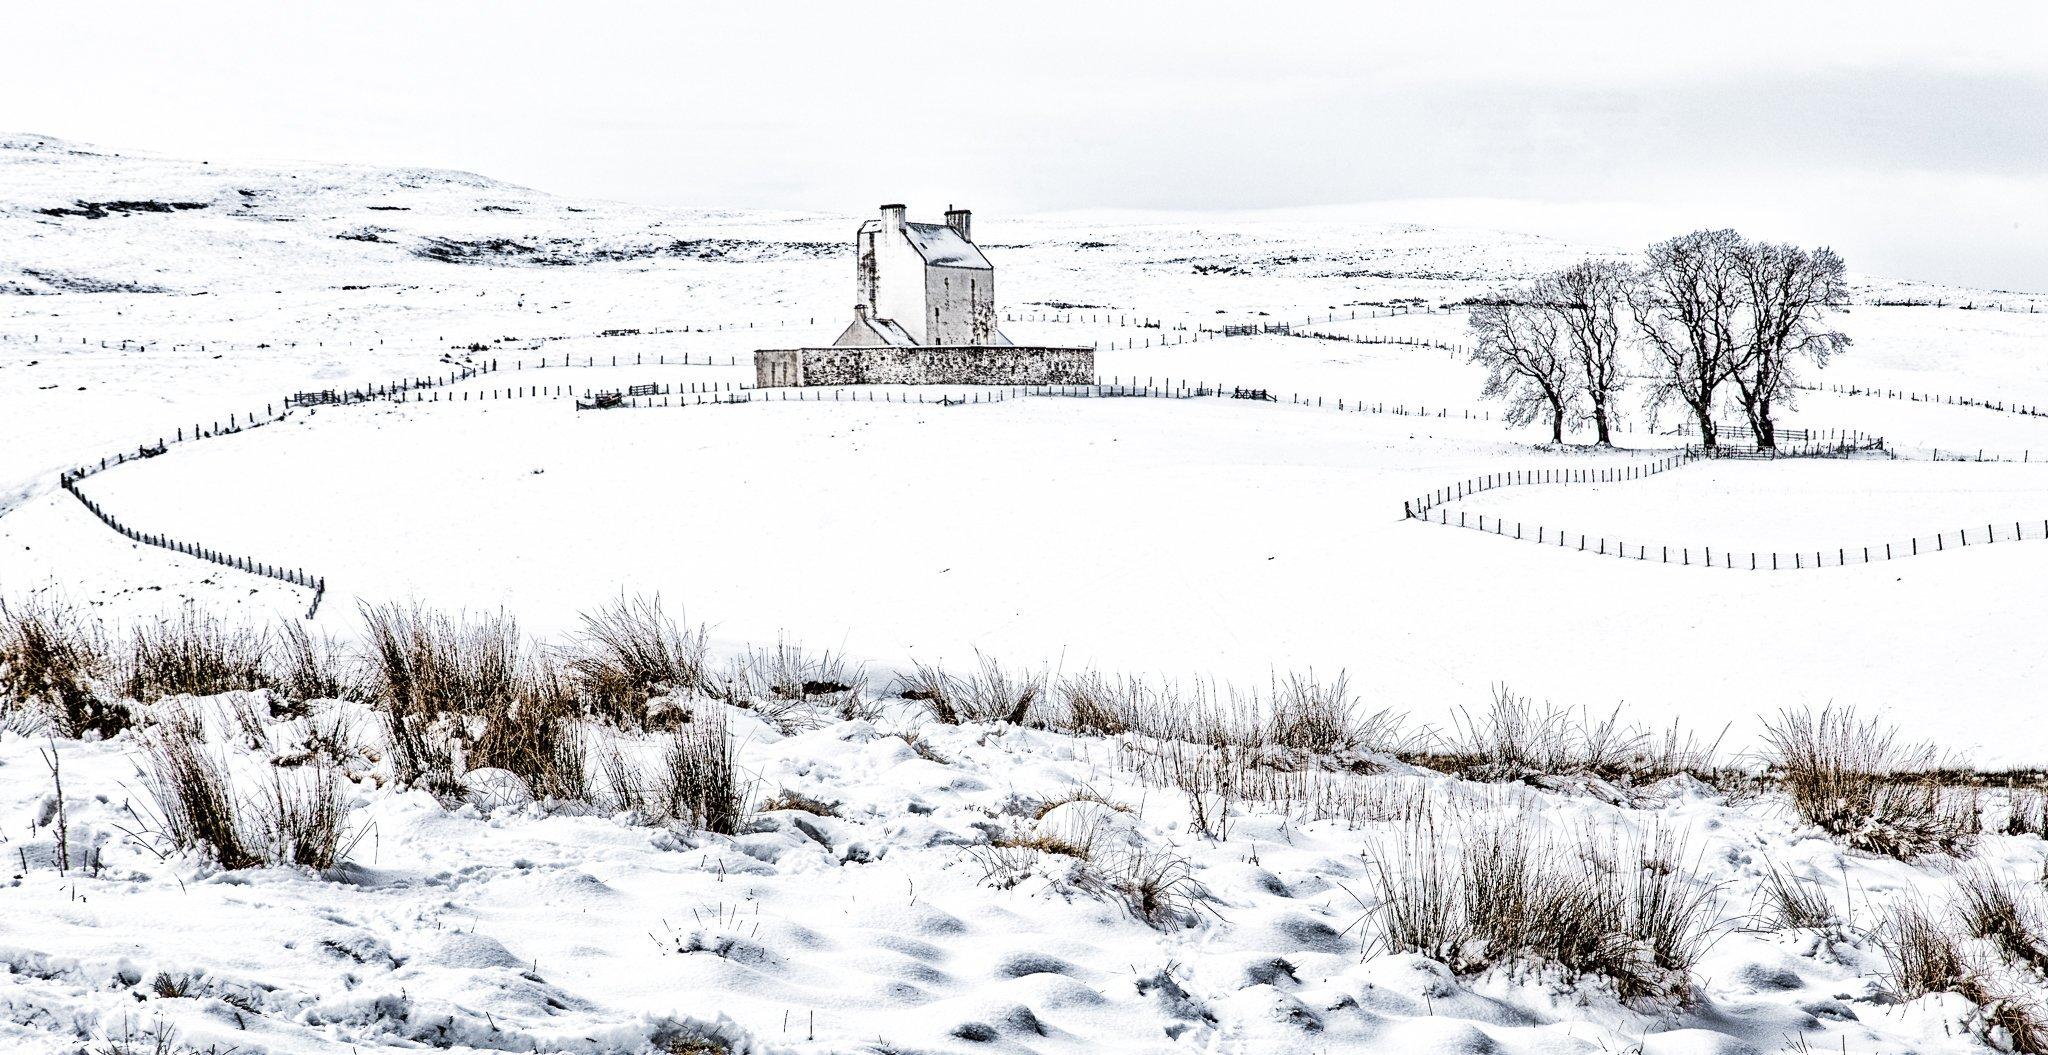 Corgarf Castle in the snow